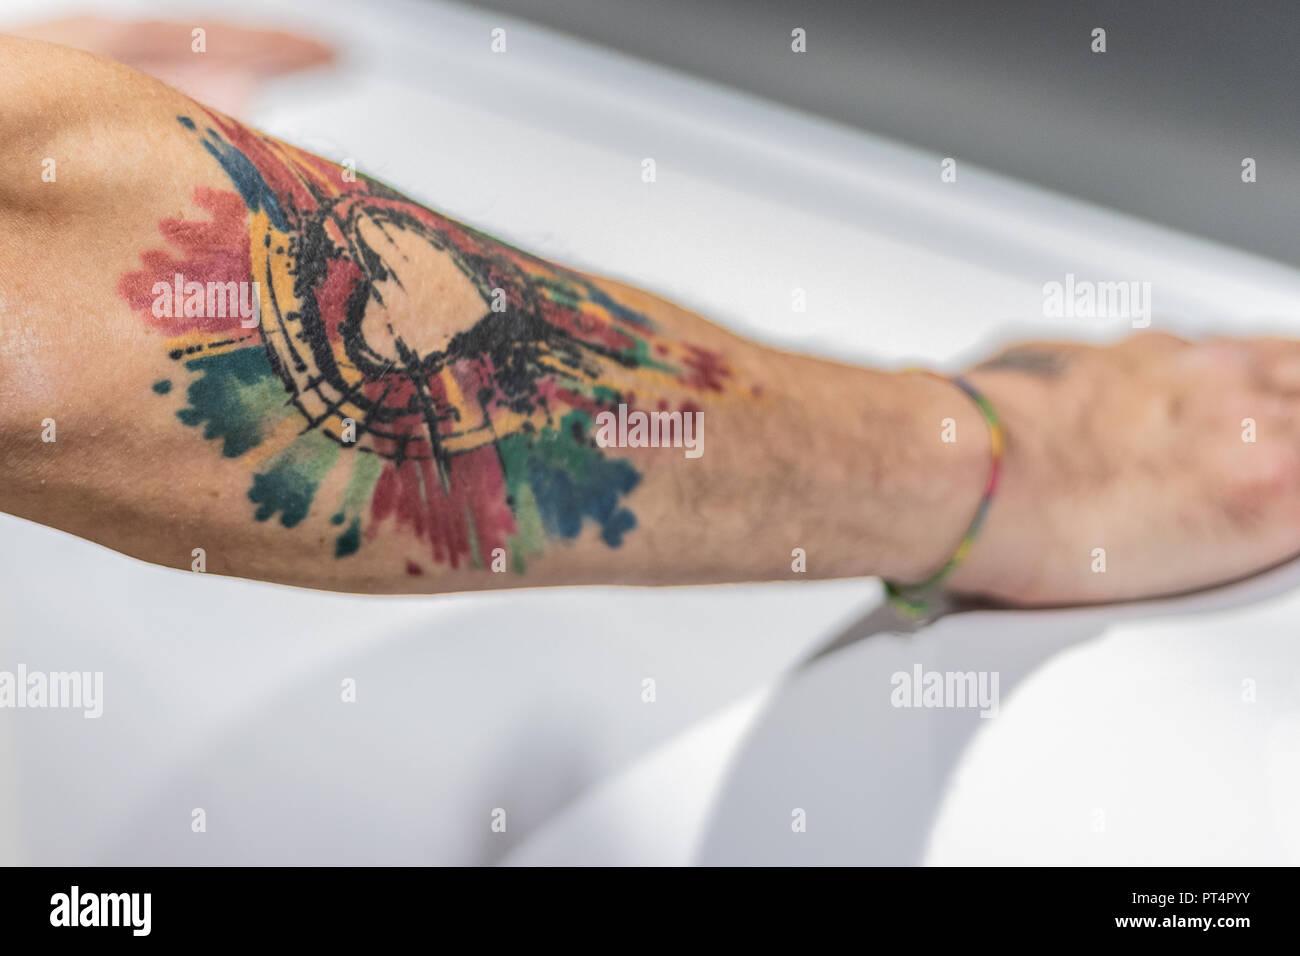 Large Tattoo Stock Photos & Large Tattoo Stock Images - Alamy